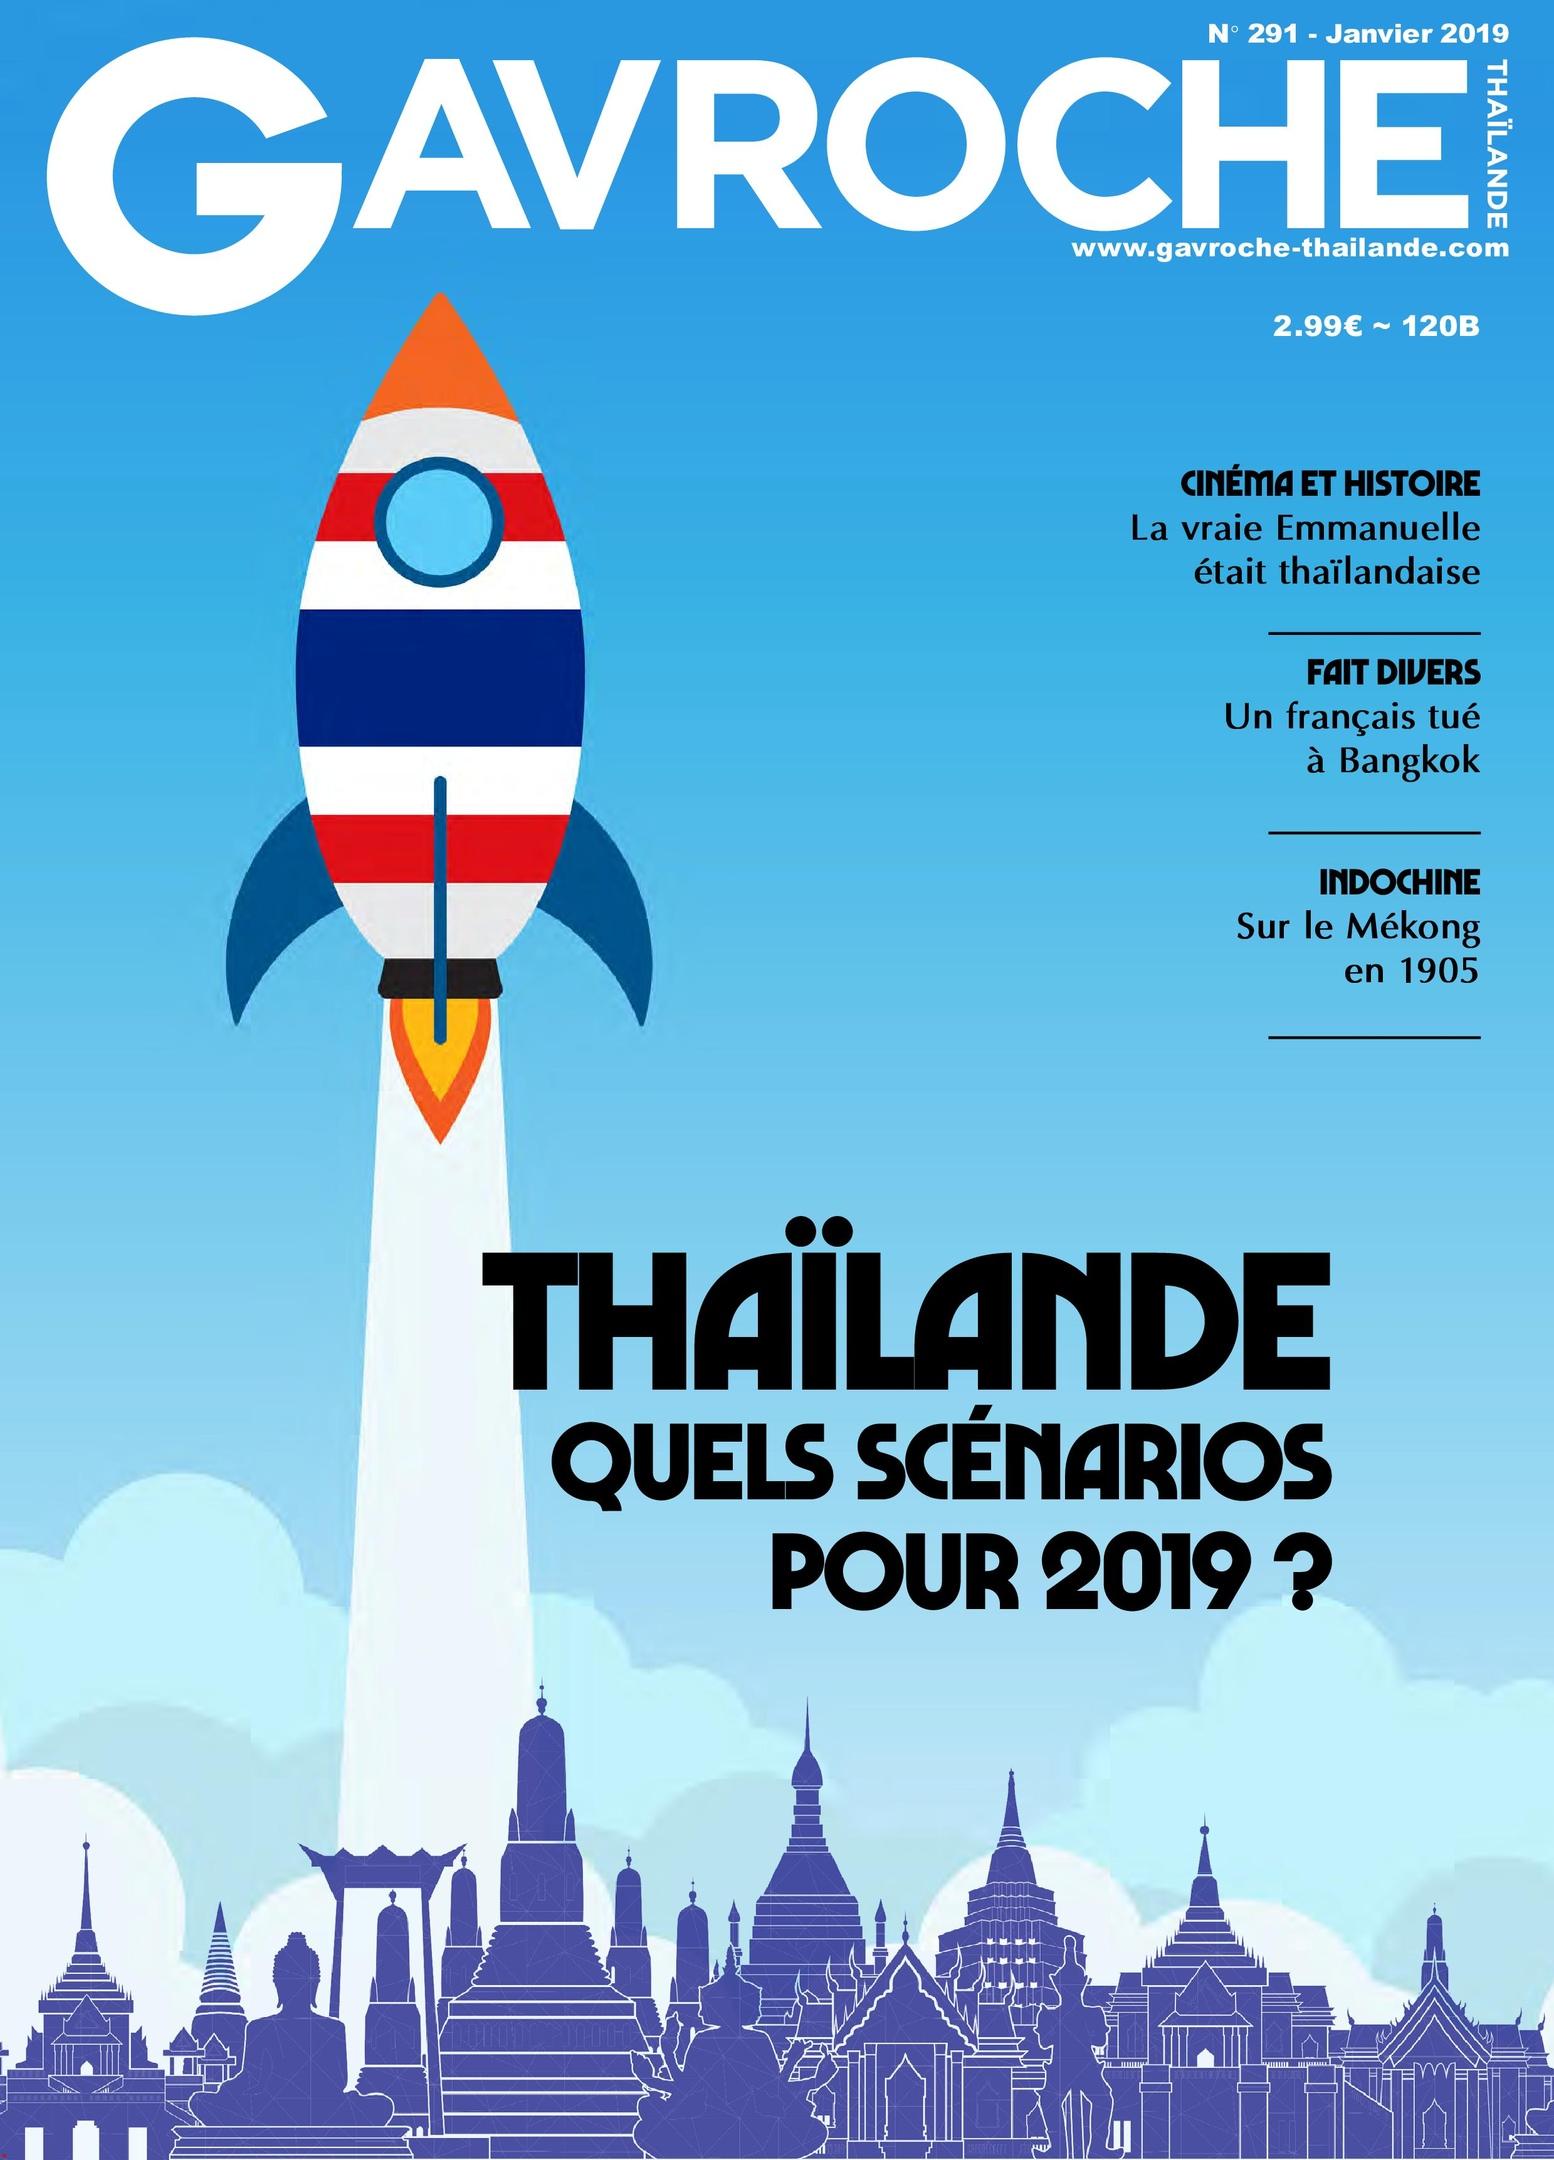 Gavroche Thaïlande – Janvier 2019